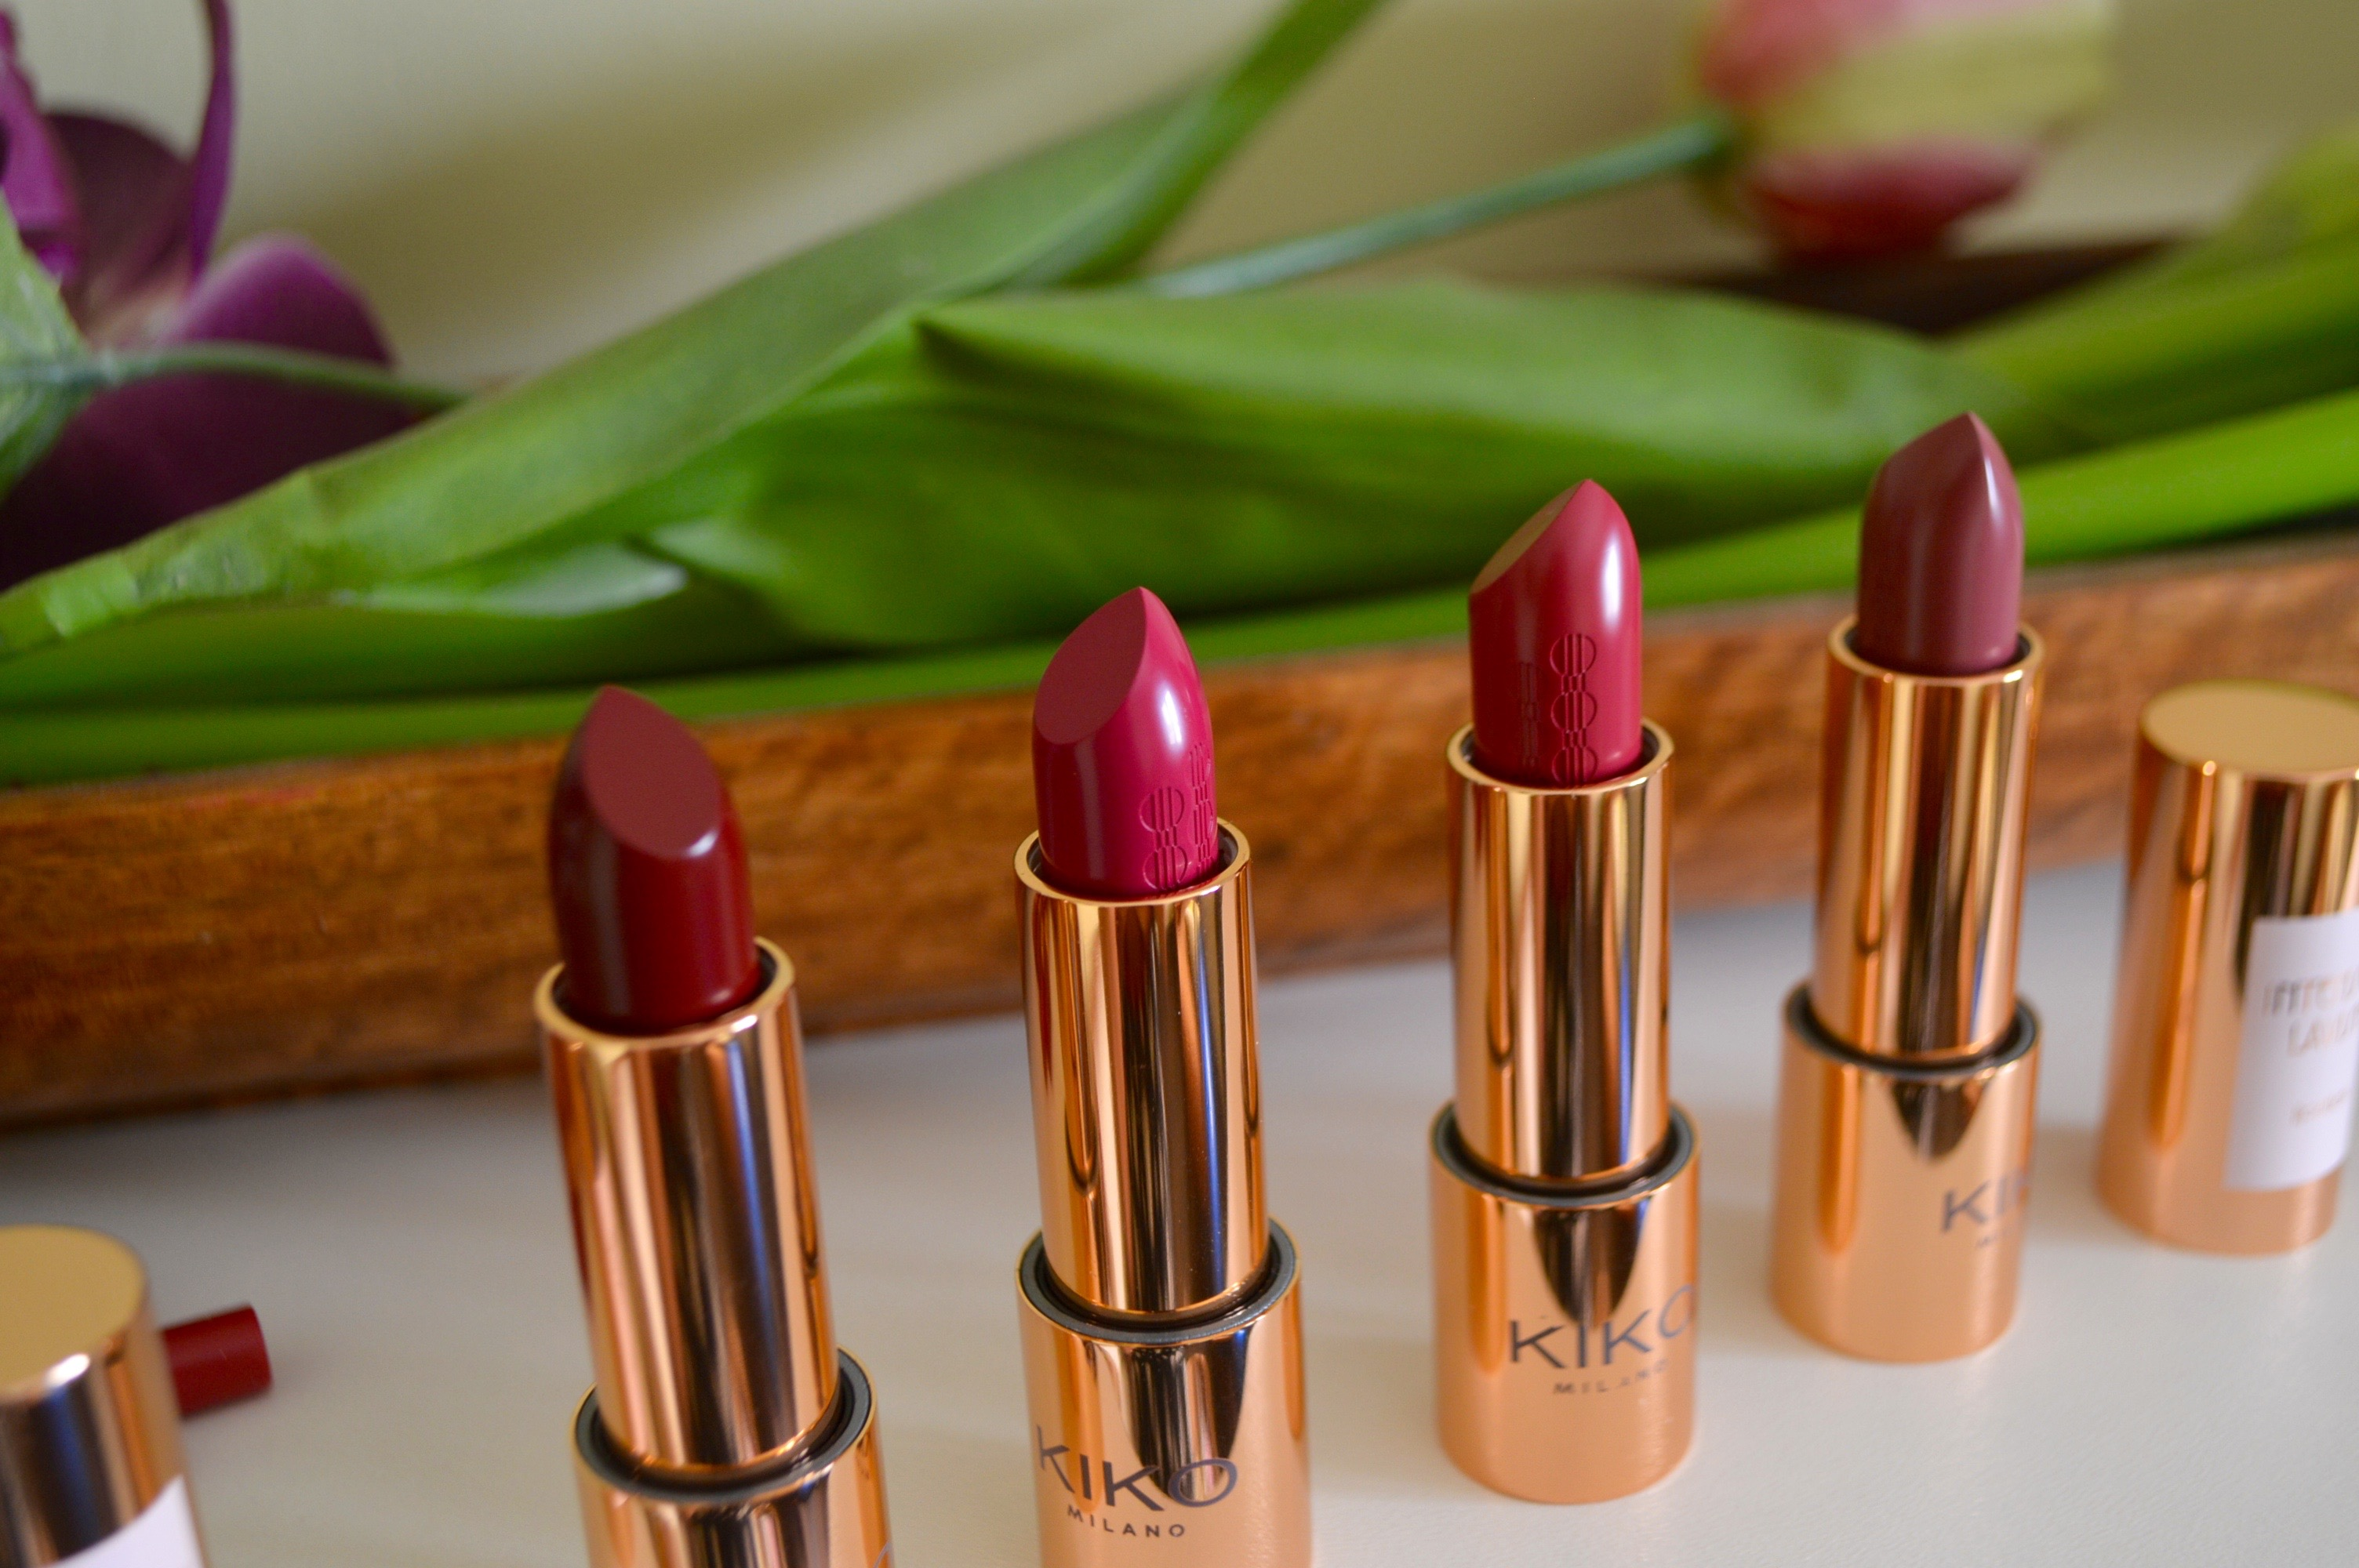 kiko rebel romantic intensely lavish lipstick 2